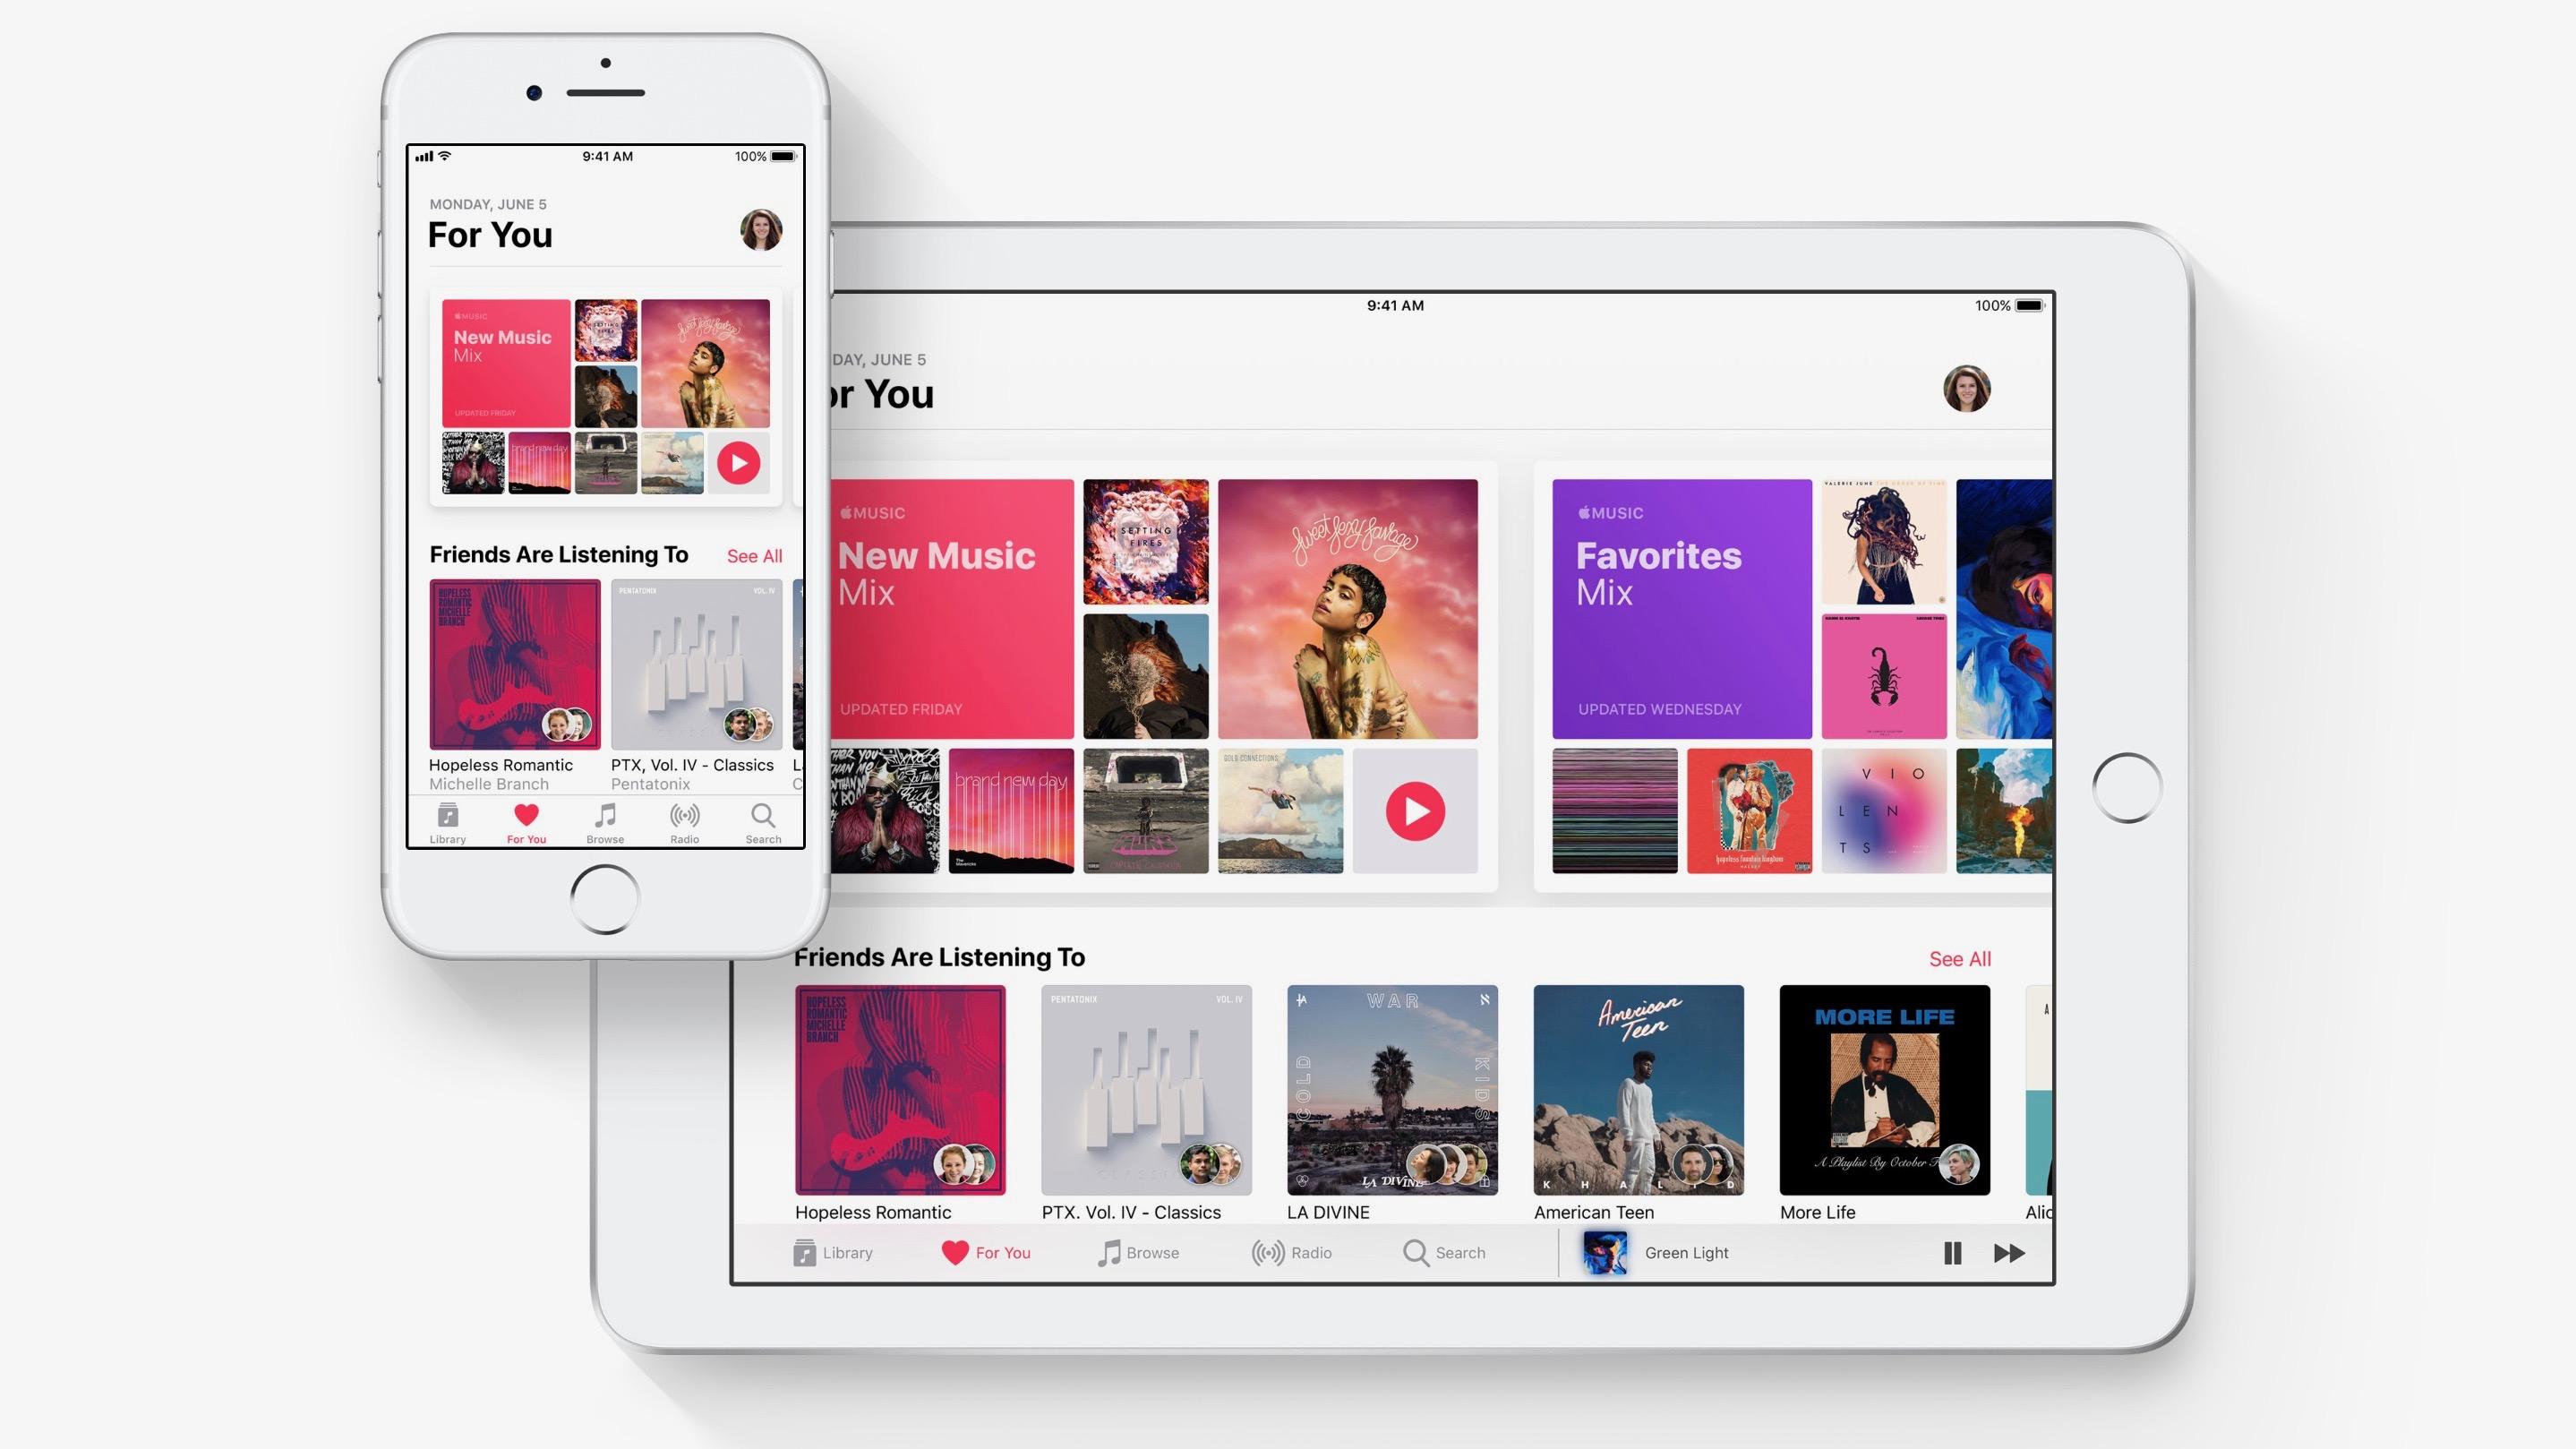 Apple releases iOS 11 developer beta 9 and public beta 8